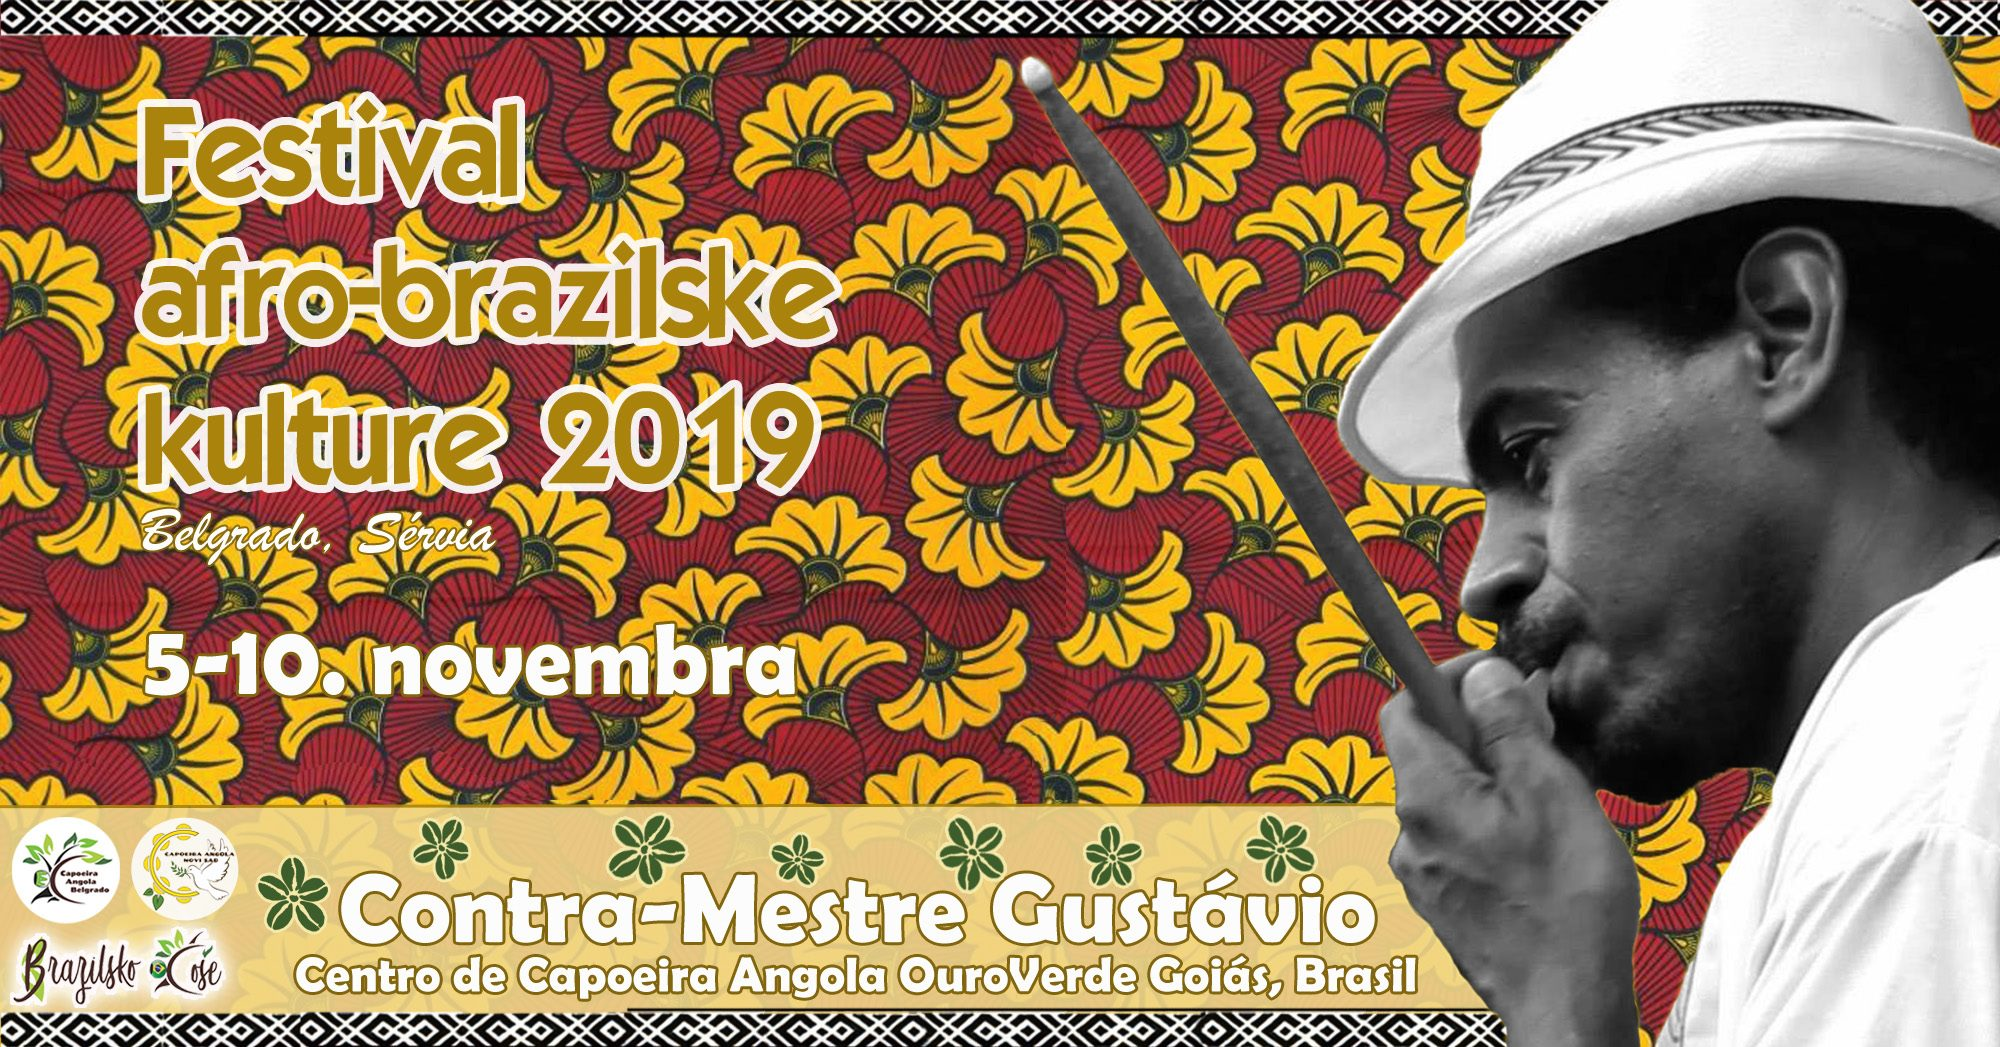 Festival afro-brazilske kulture 05 – 10.11.2019